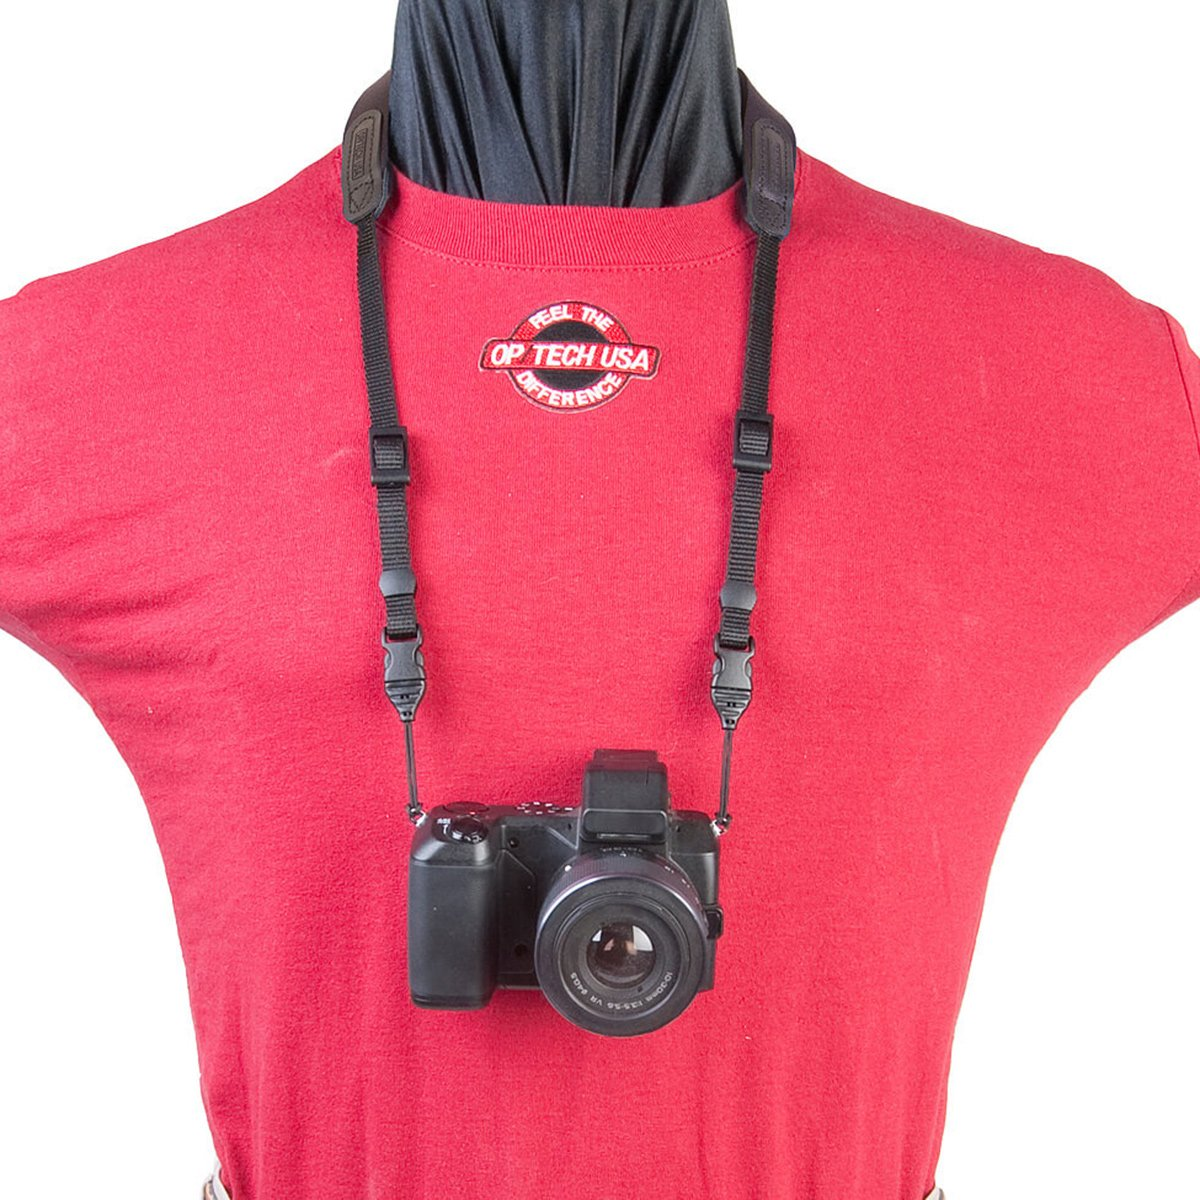 OP/TECH Bin/Op Strap QD - Correa para cámaras compactas y prismáticos, color azul marino OP/TECH USA 2203021